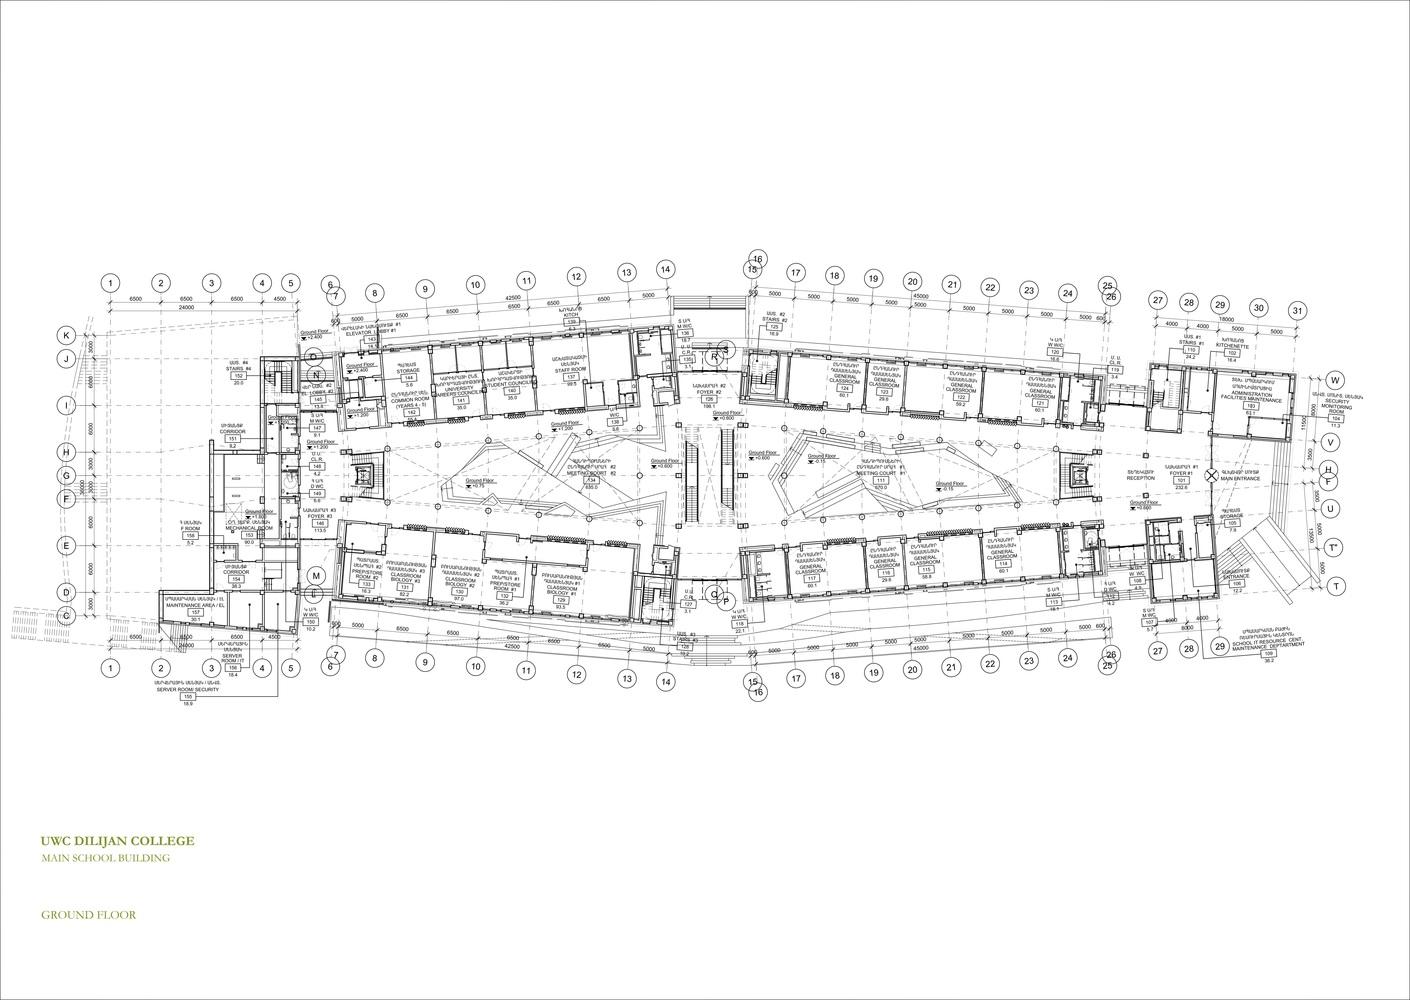 medium resolution of uwc dilijan college ground floor plan